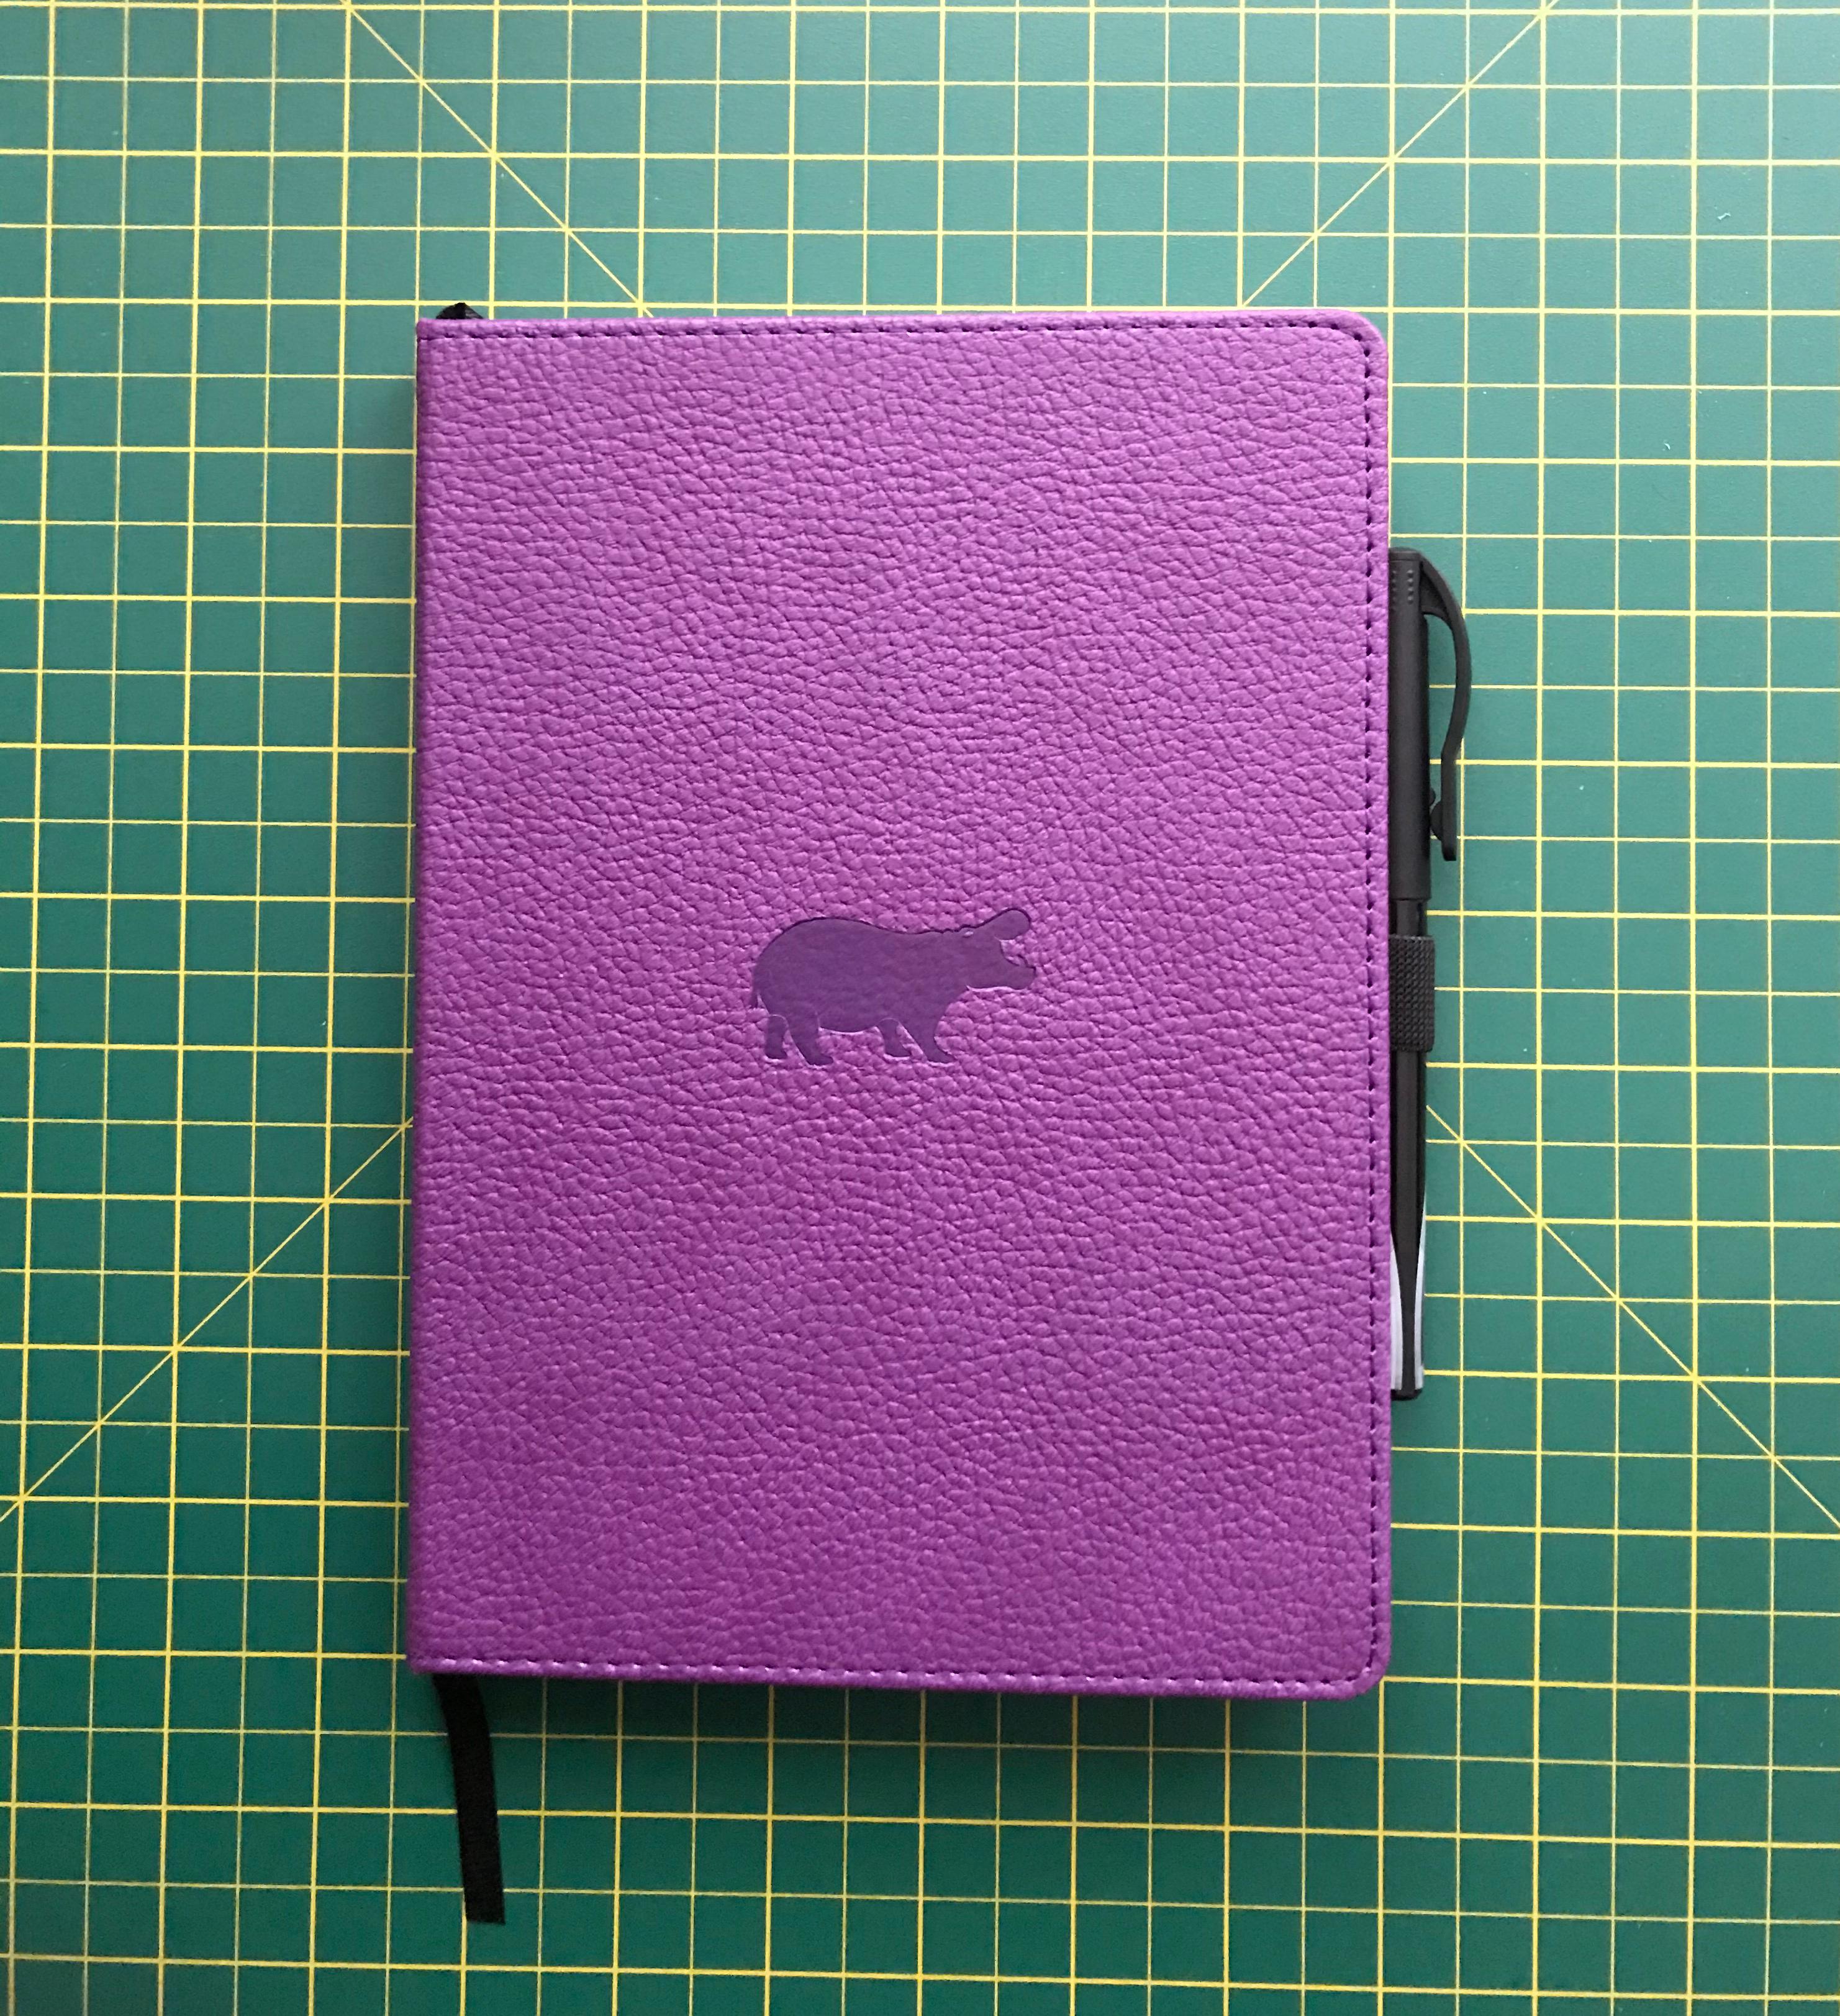 Purple hippo dingbats notebook